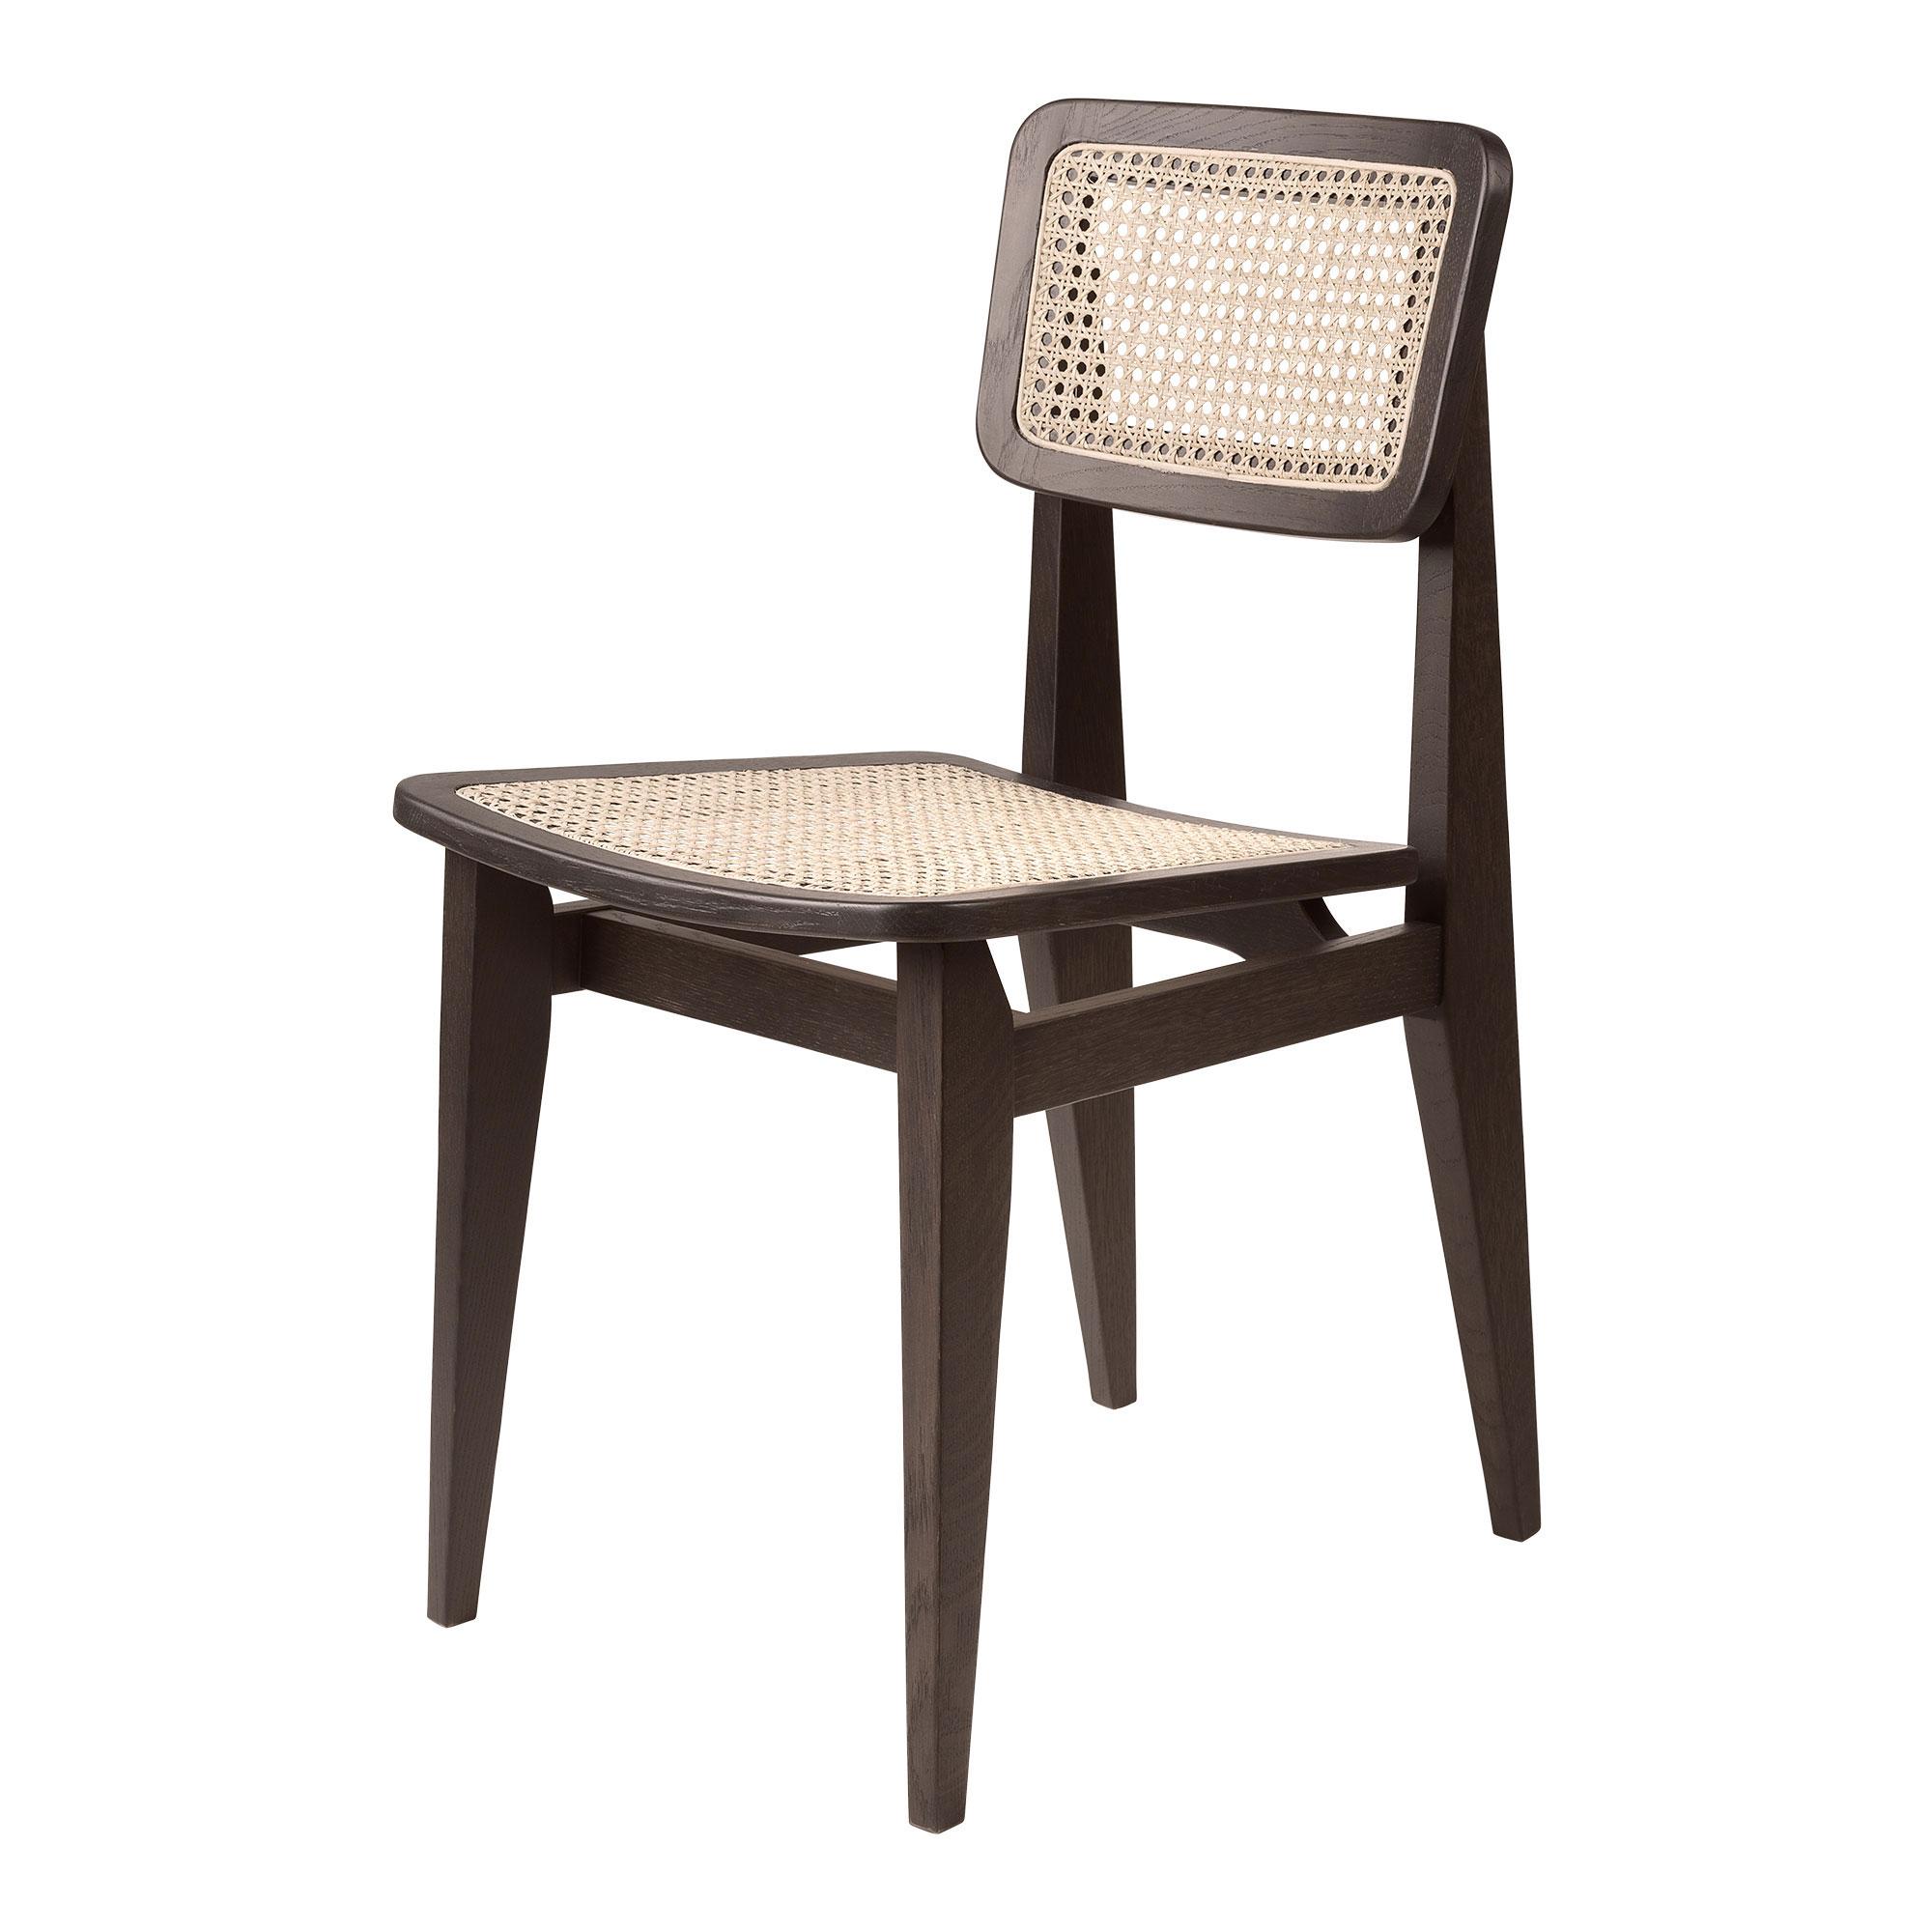 Svært C-Chair Dining Chair French Cane/ Black Oak Stol | Gubi | Länna ZH-11